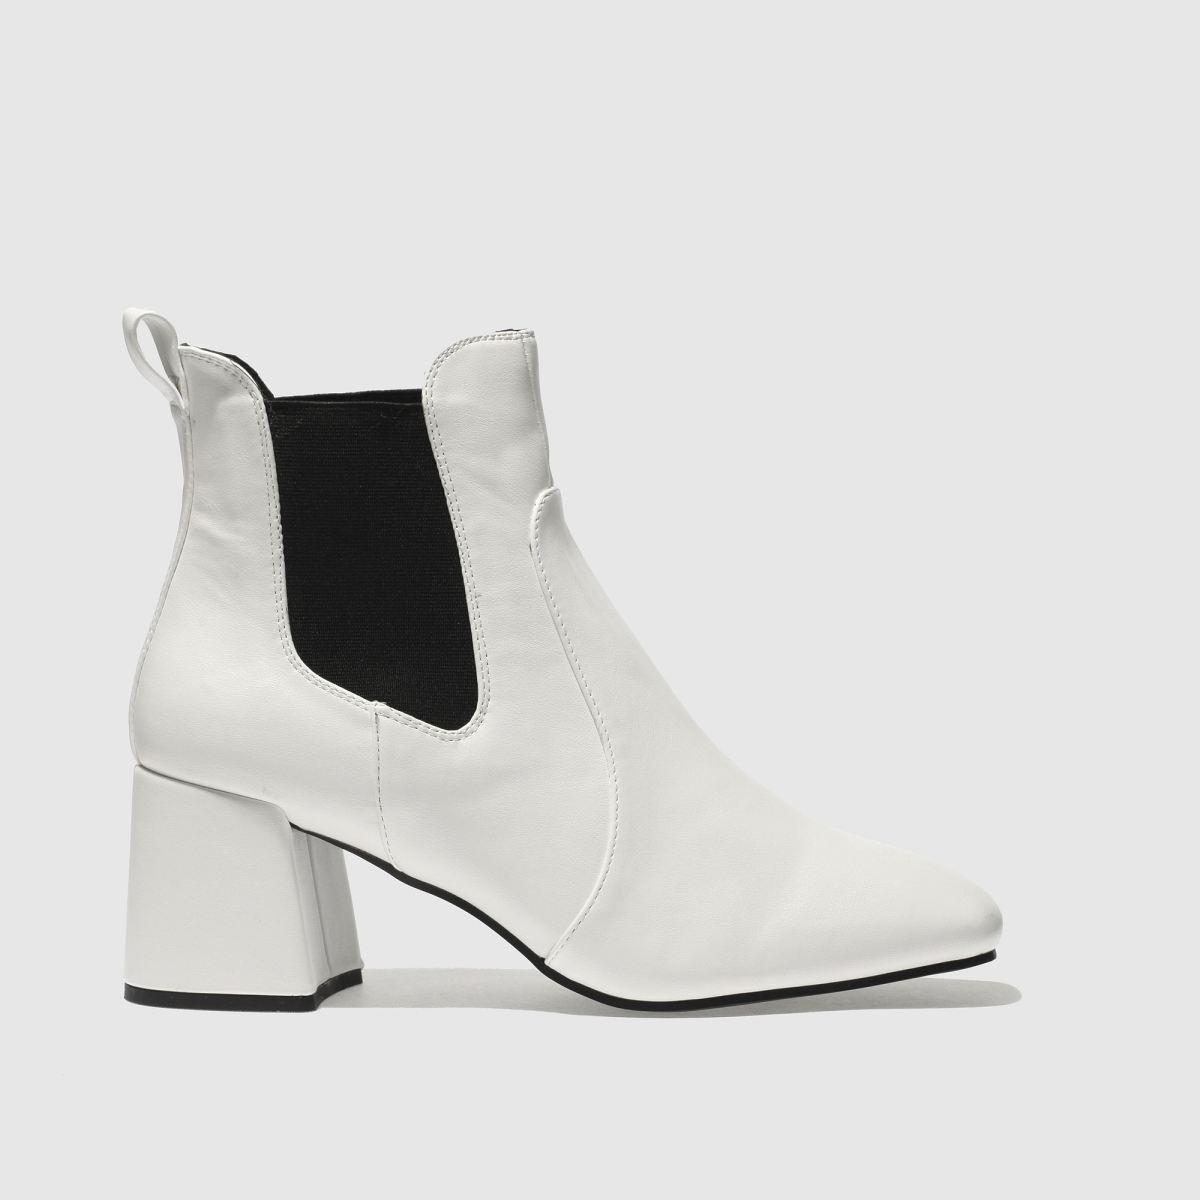 Schuh White & Black Fresh Boots